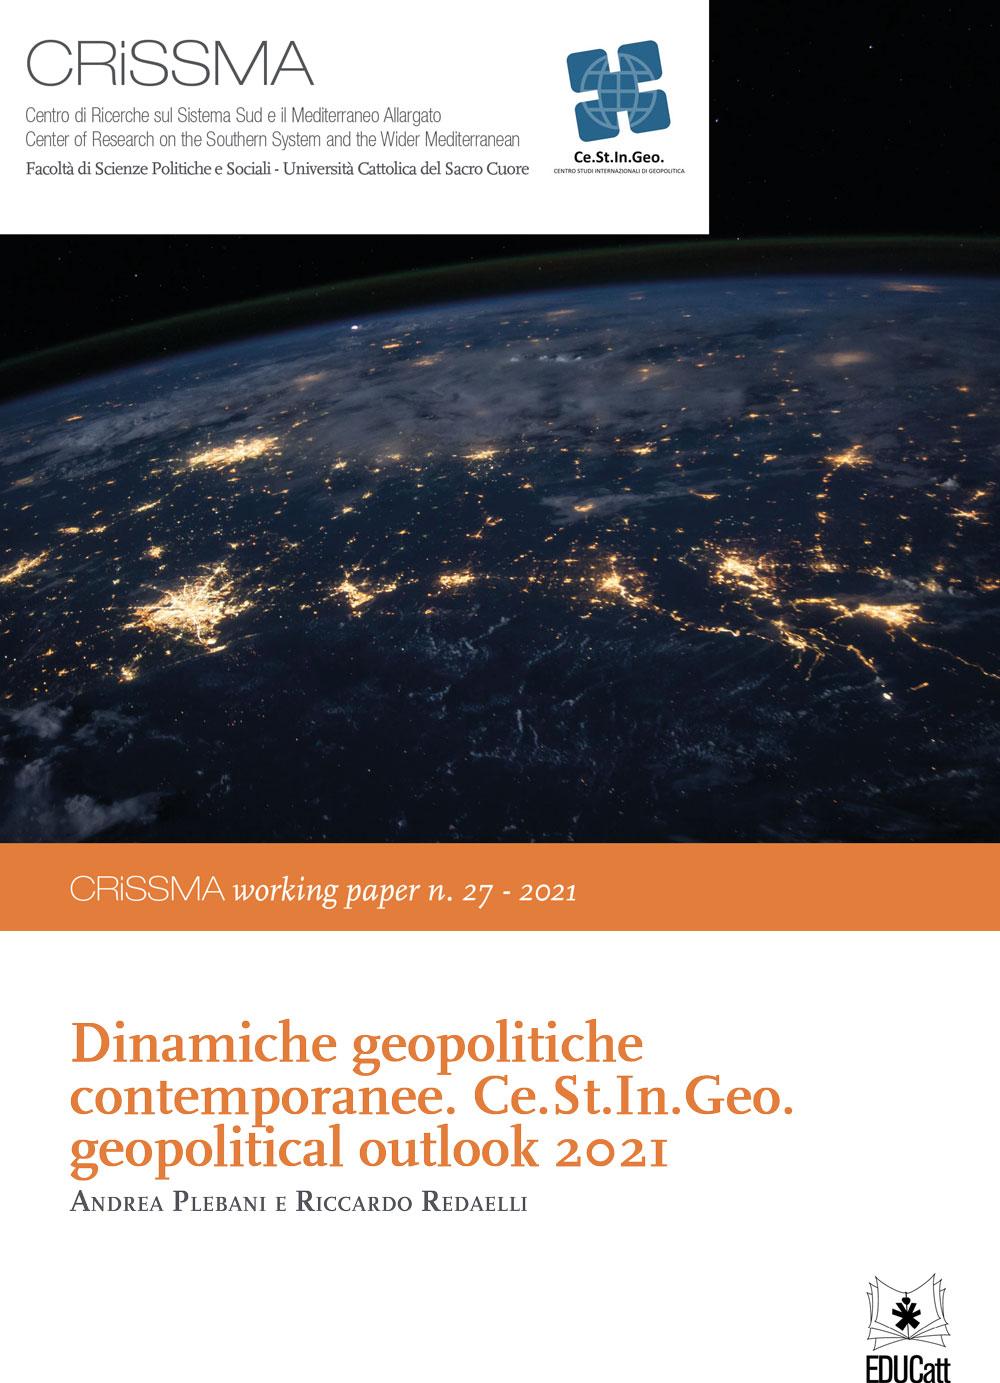 DINAMICHE GEOPOLITICHE CONTEMPORANEE.CE.ST.IN.GEO. GEOPOLITICAL OUTLOOK 2021